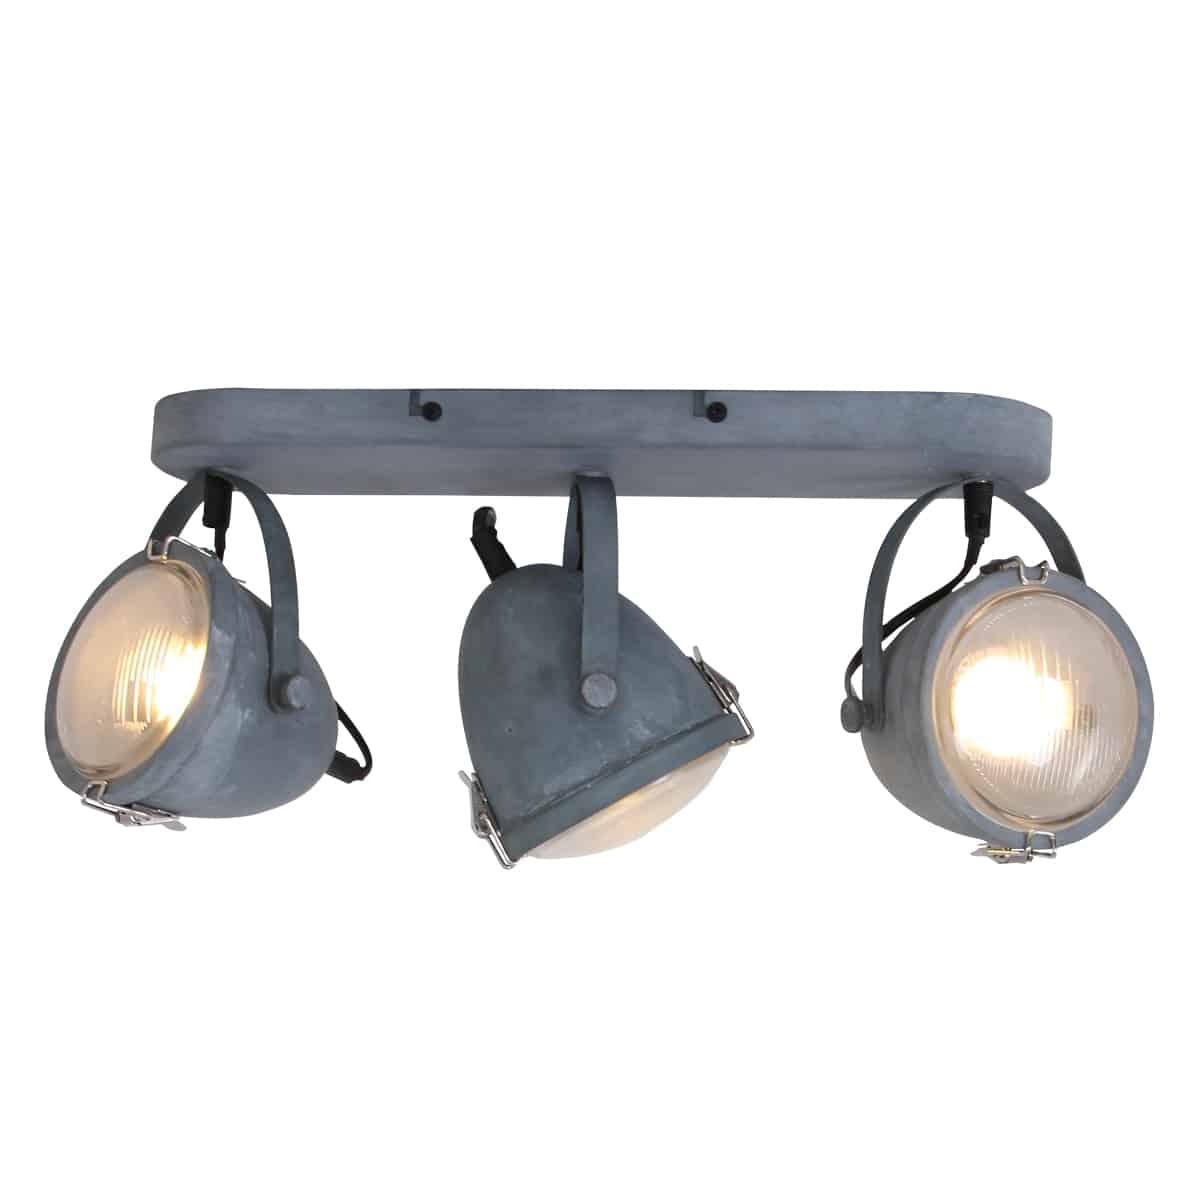 Relativ LED Spot/Strahler Steinhauer Mexlite Wandlampe Industrie-Vintage JG77